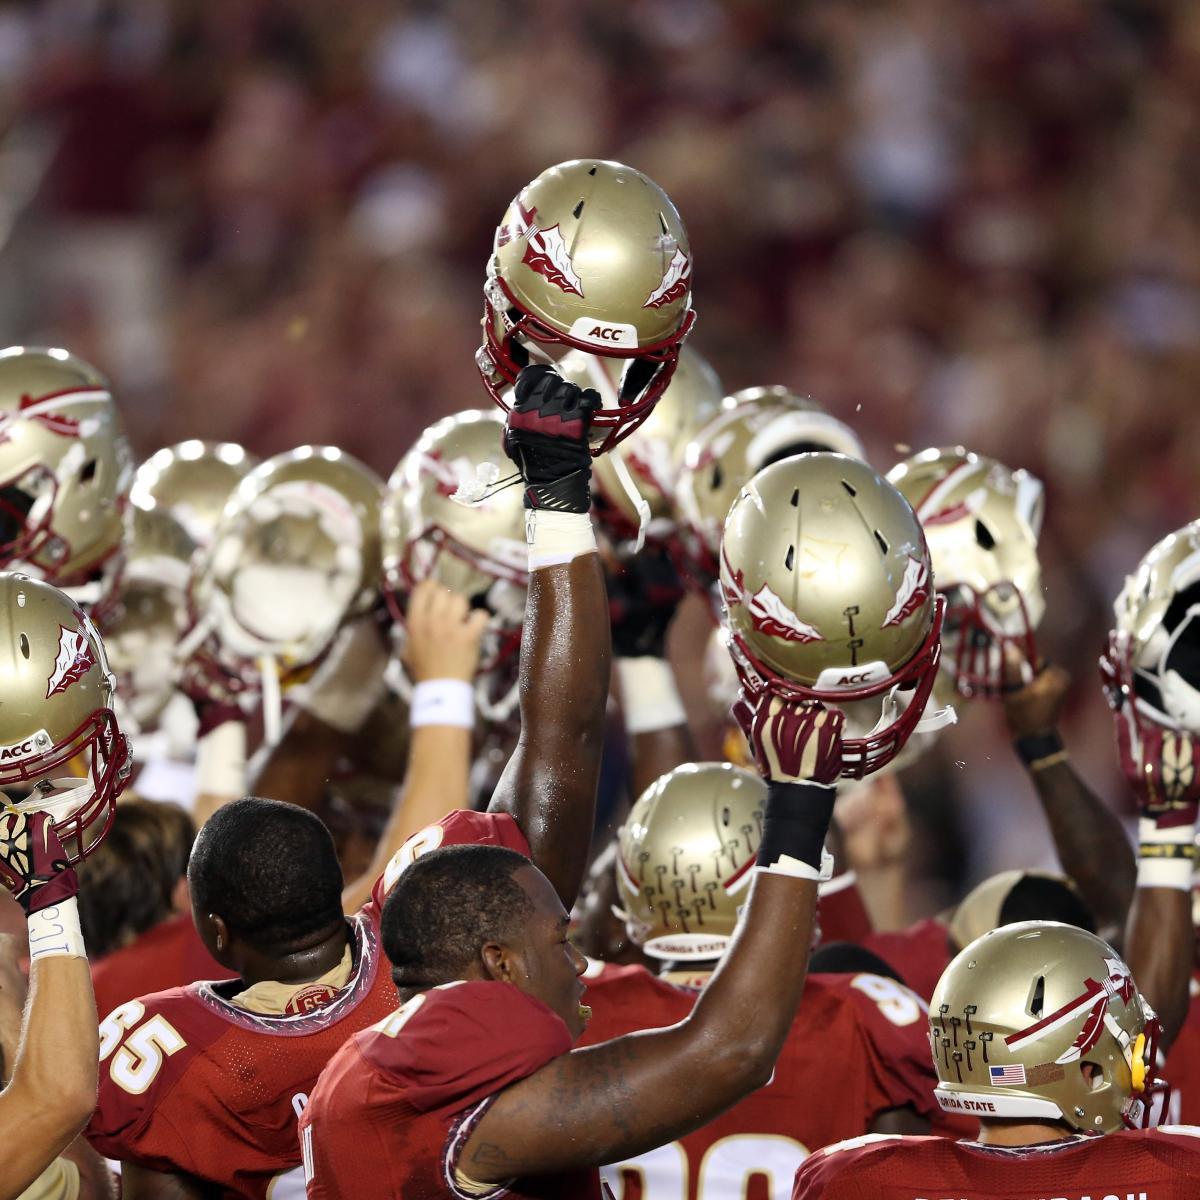 College Football Realignment Scenarios 2012